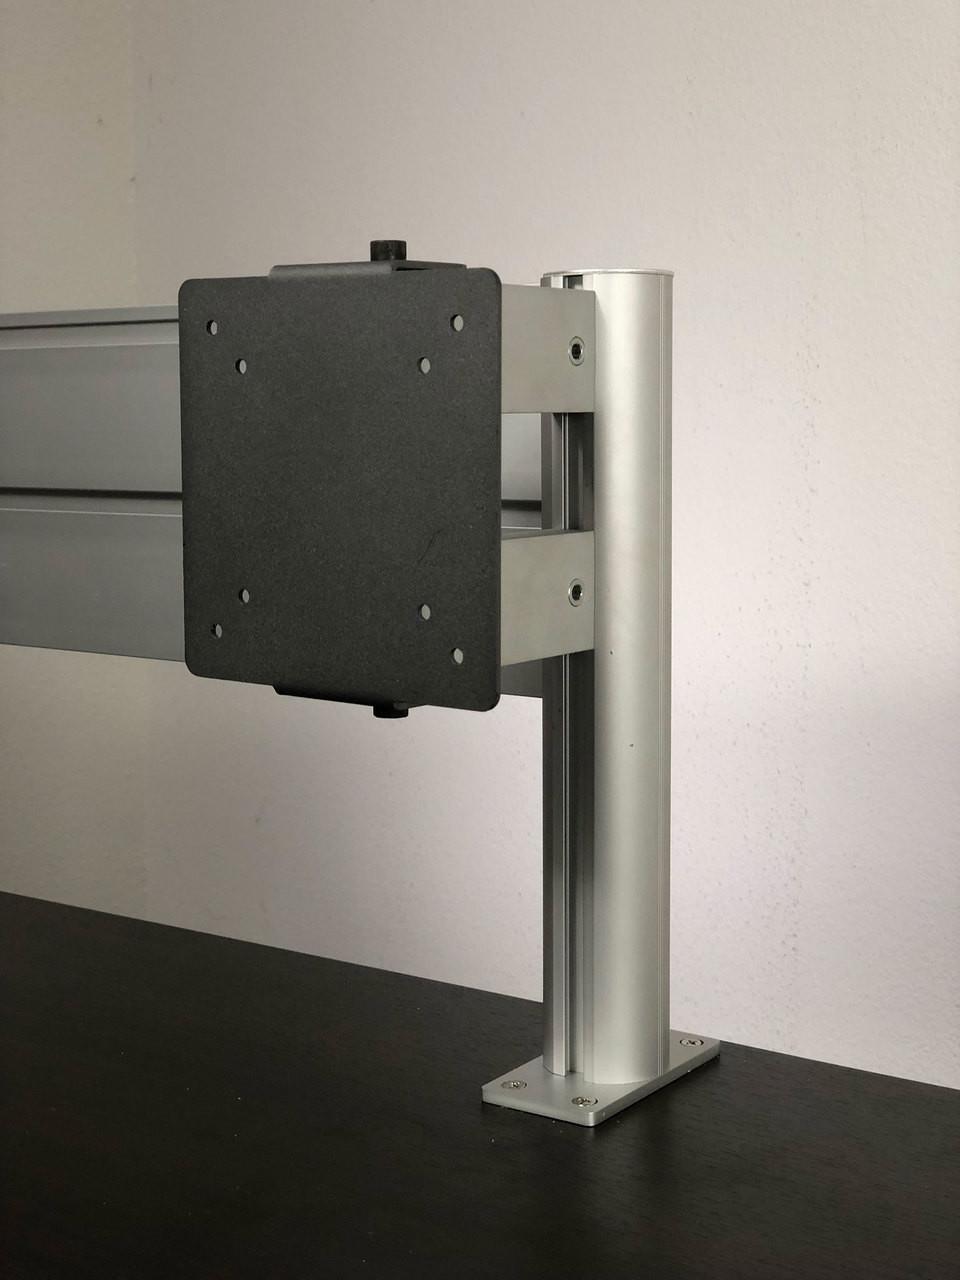 VESA Monitor Mount for Aluminum Organizer Slatwall w/ Short Arm, #OT-SUL-HANG5